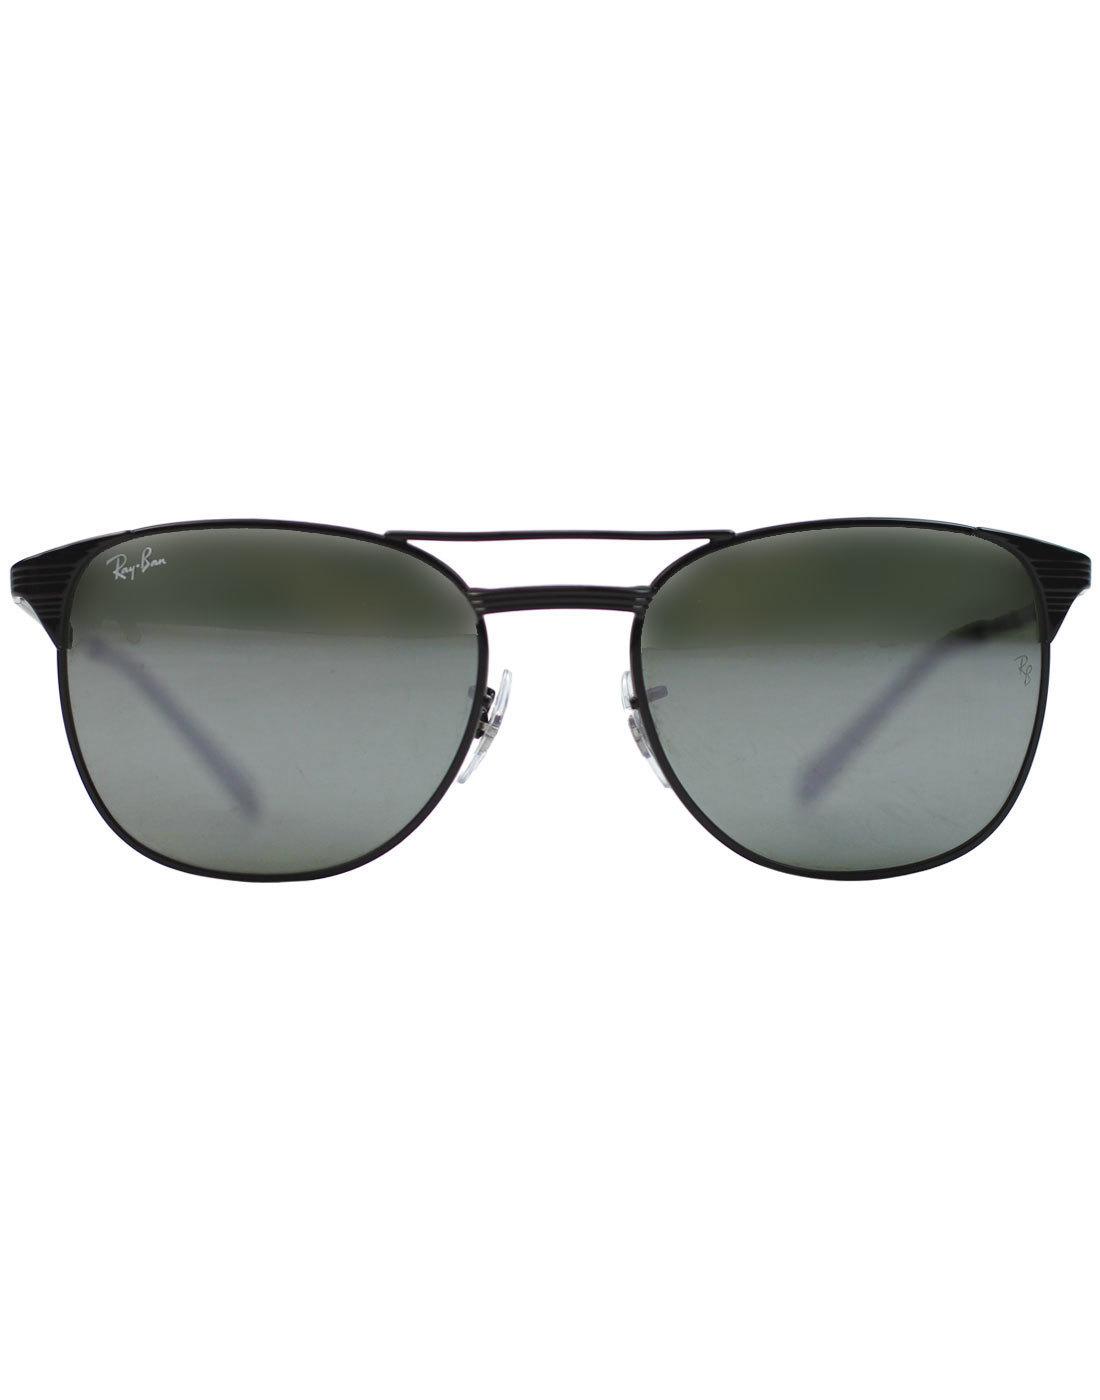 Signet RAY-BAN Retro 50s Sunglasses - Black Mirror